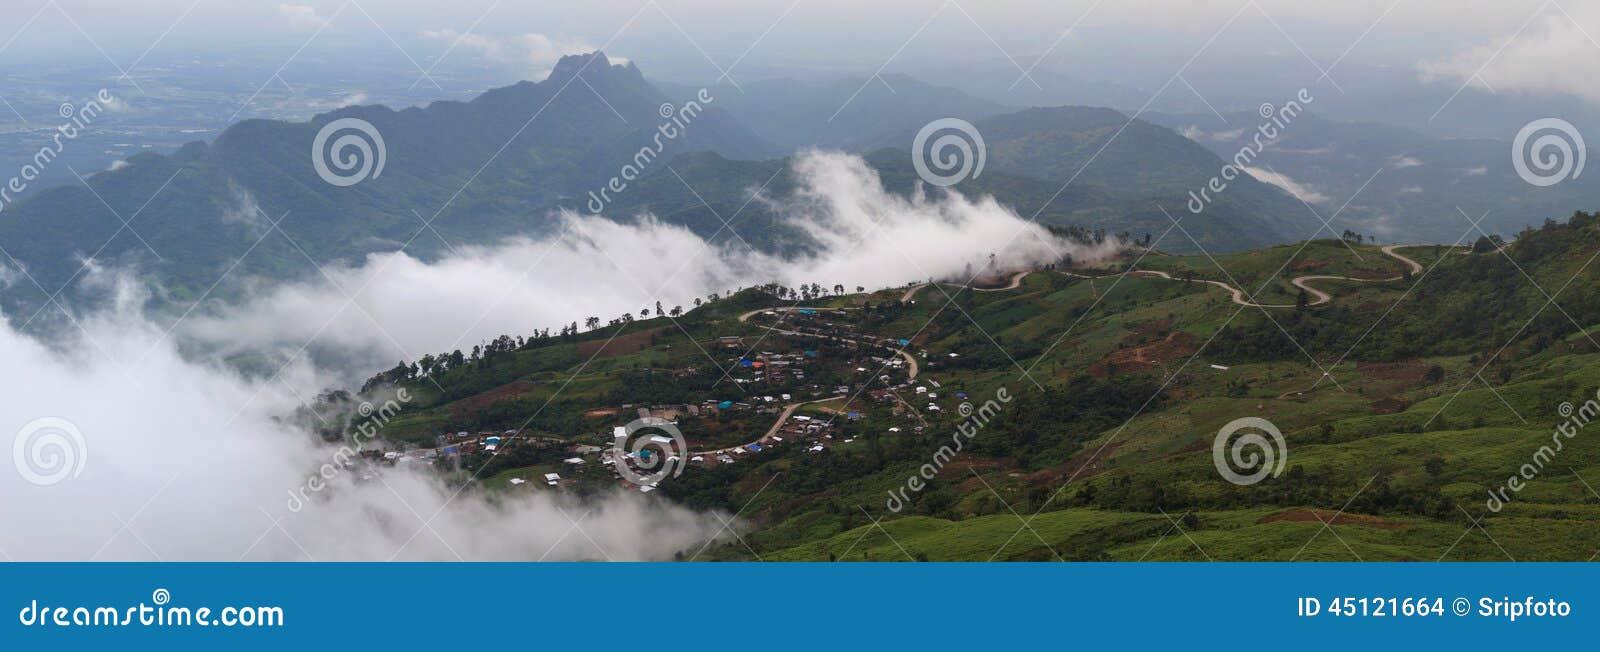 Beautiful mountain scenery in Phutabberk Phetchabun, Thailand